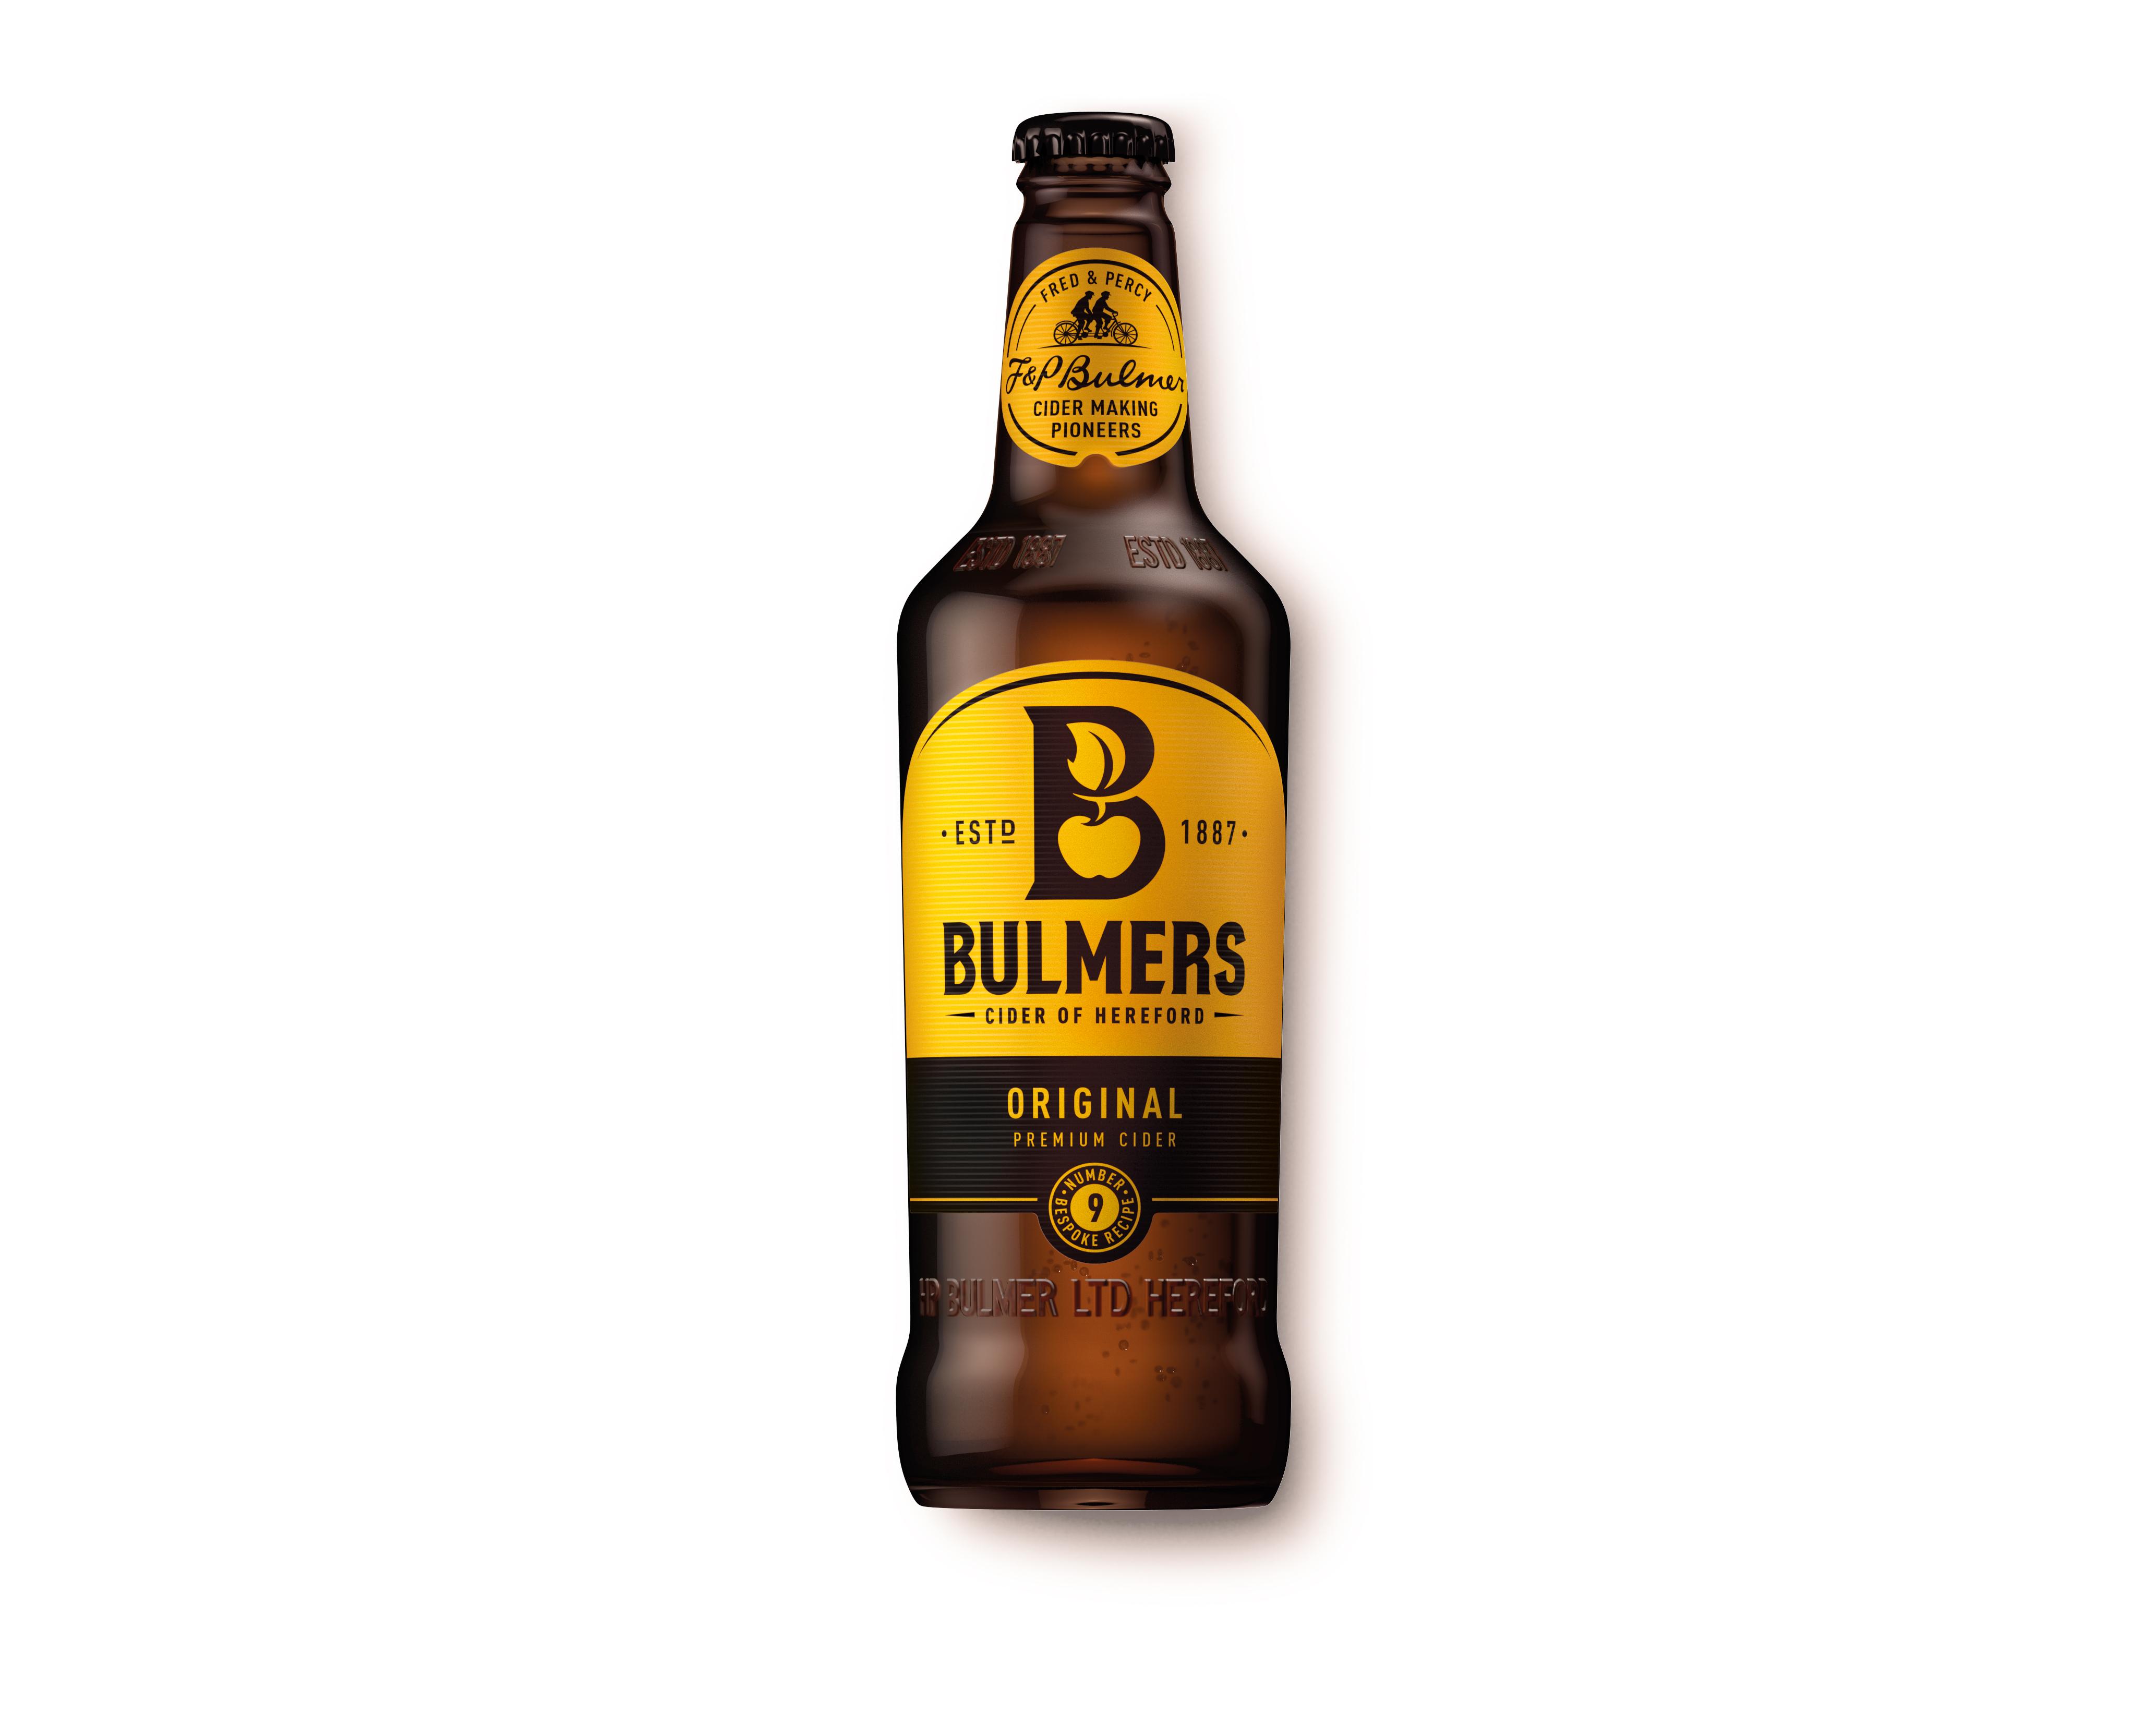 BULMERS Original Cider 0,5L   Weinmixgetränke & Bowlen   Wein ...